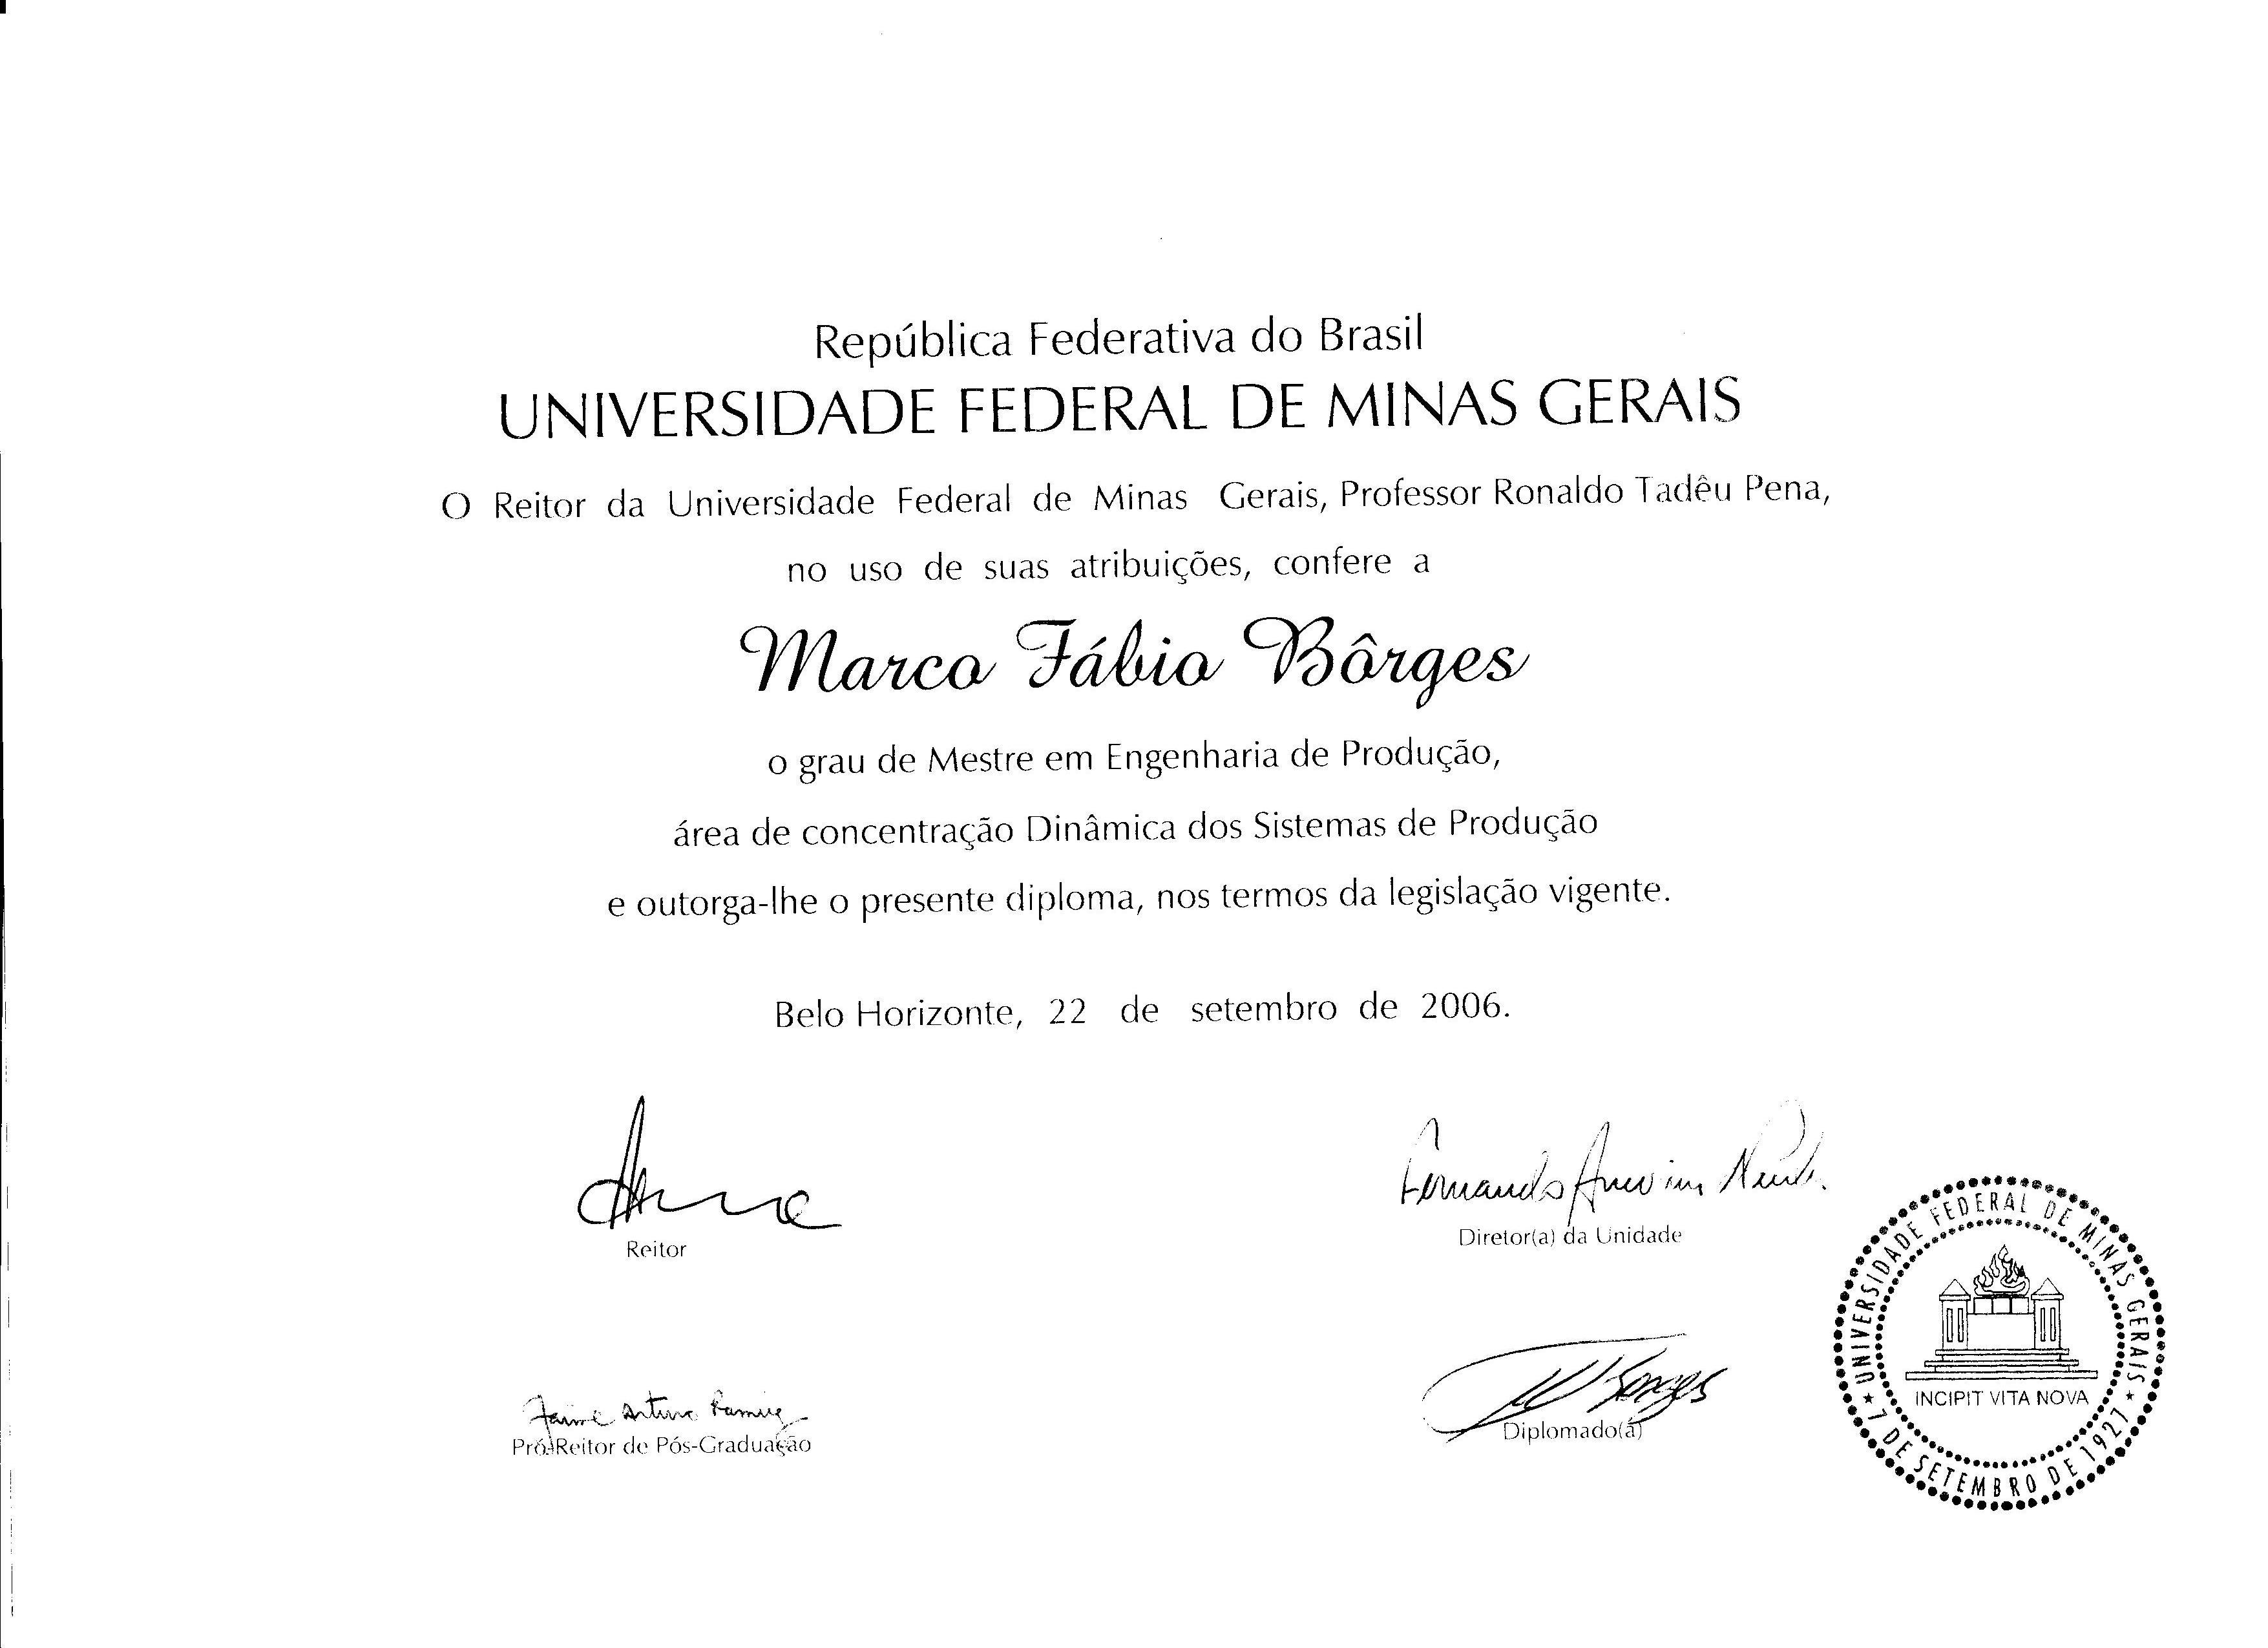 Diploma Marco frente